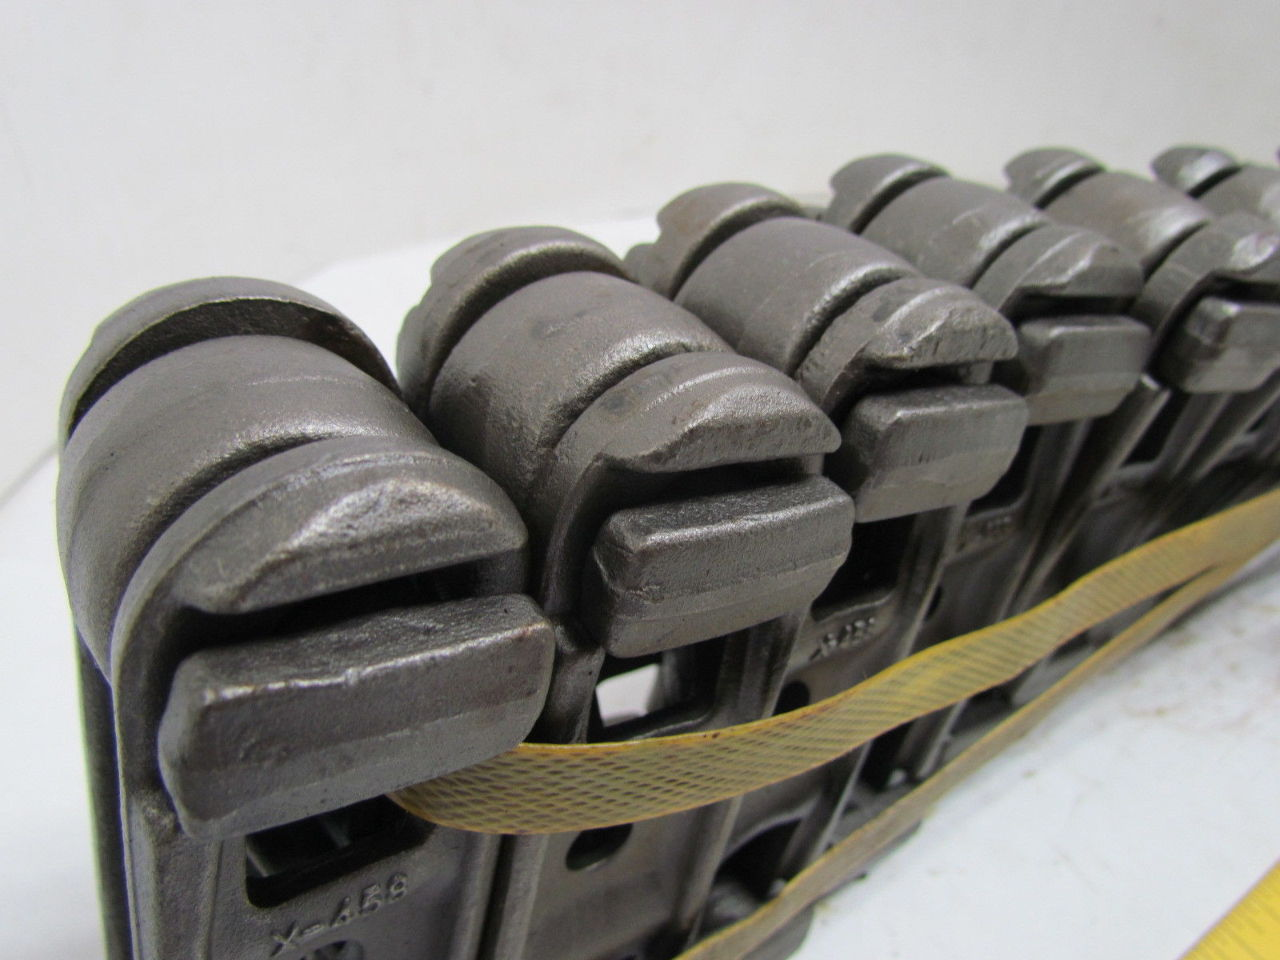 Drop Forged Chain : Tsubaki drop forged rivetless chain ft ebay